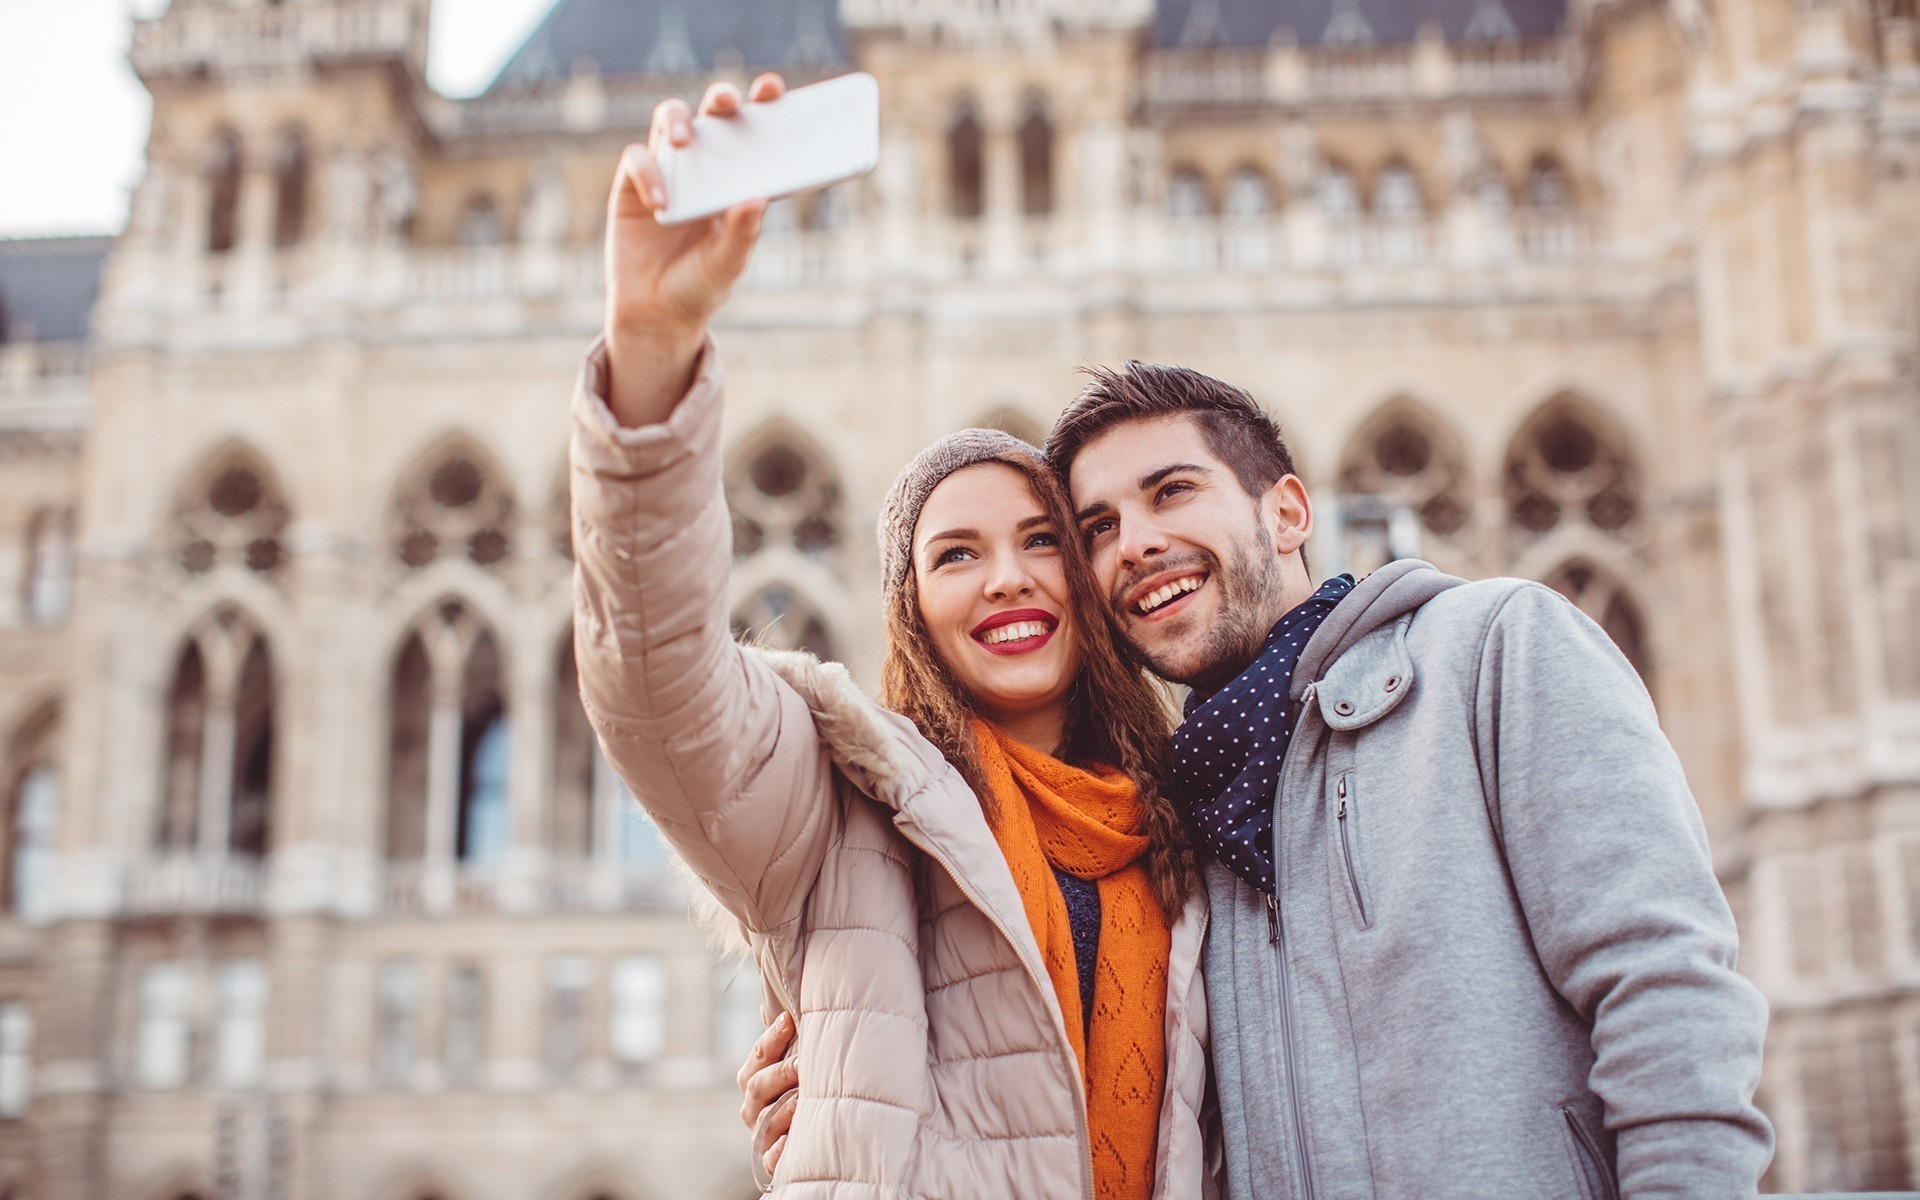 dating με Ουρουγουάης ραντεβού που πληρώνει για δείπνο